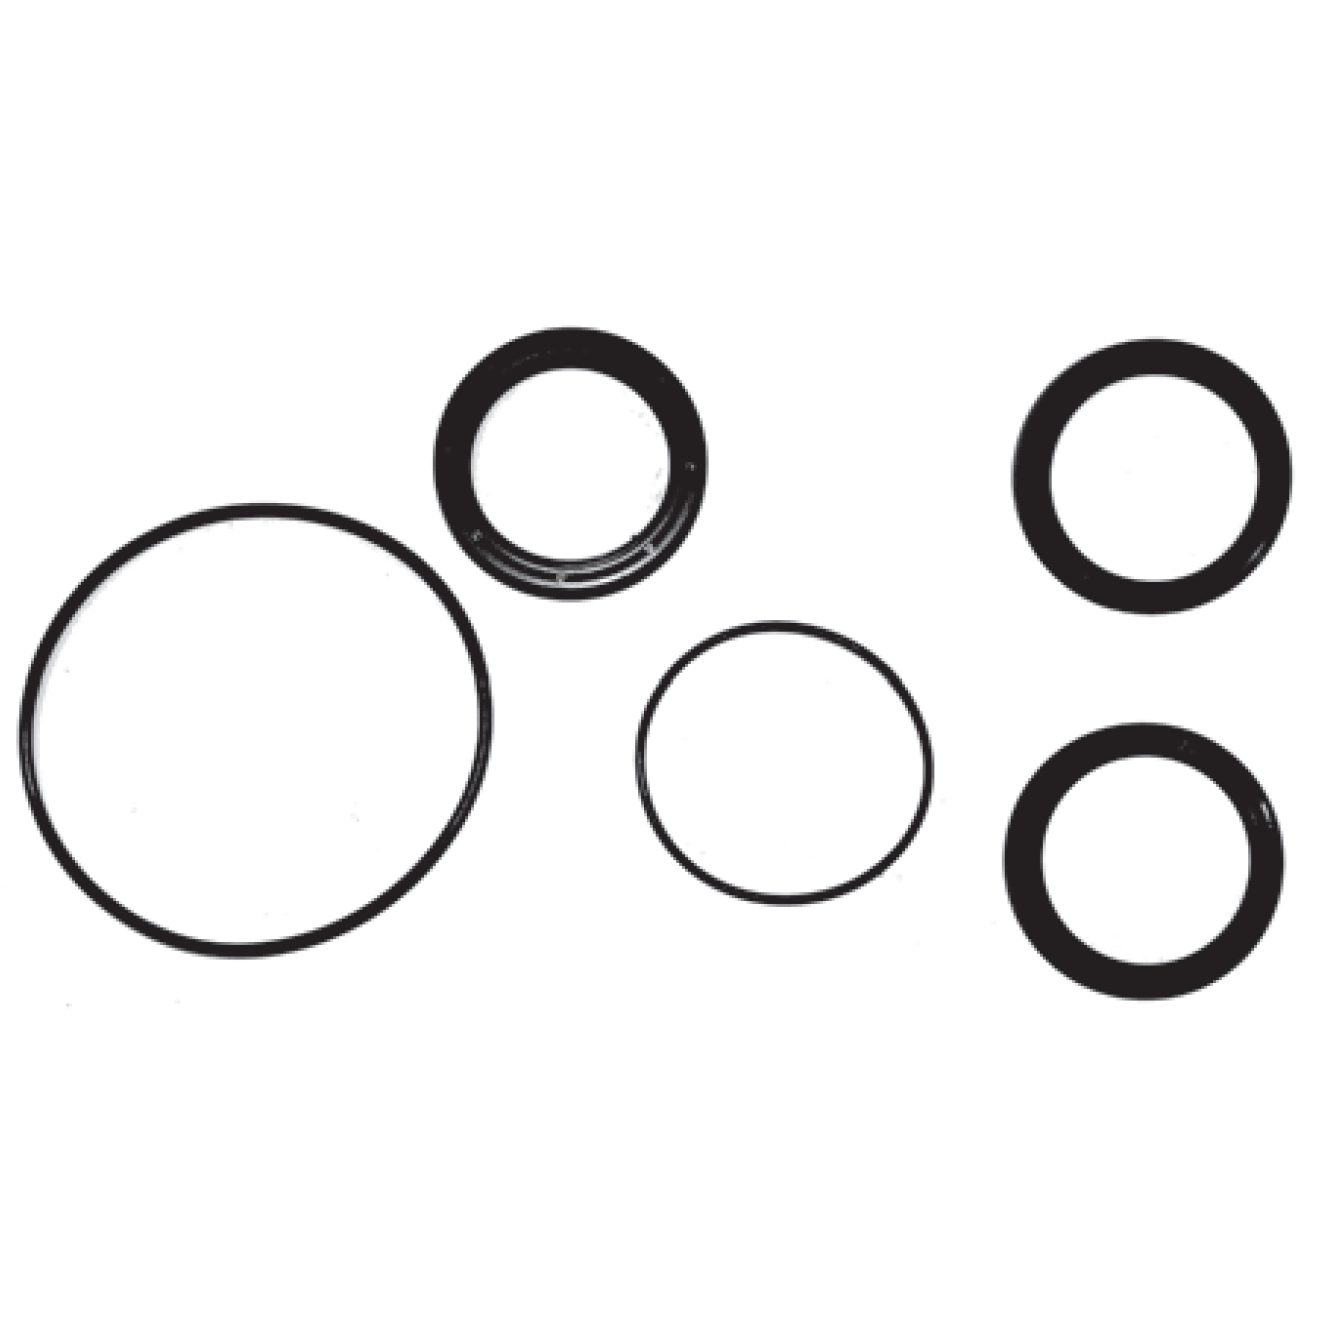 category-merc-crankshaft-seal-kits.png